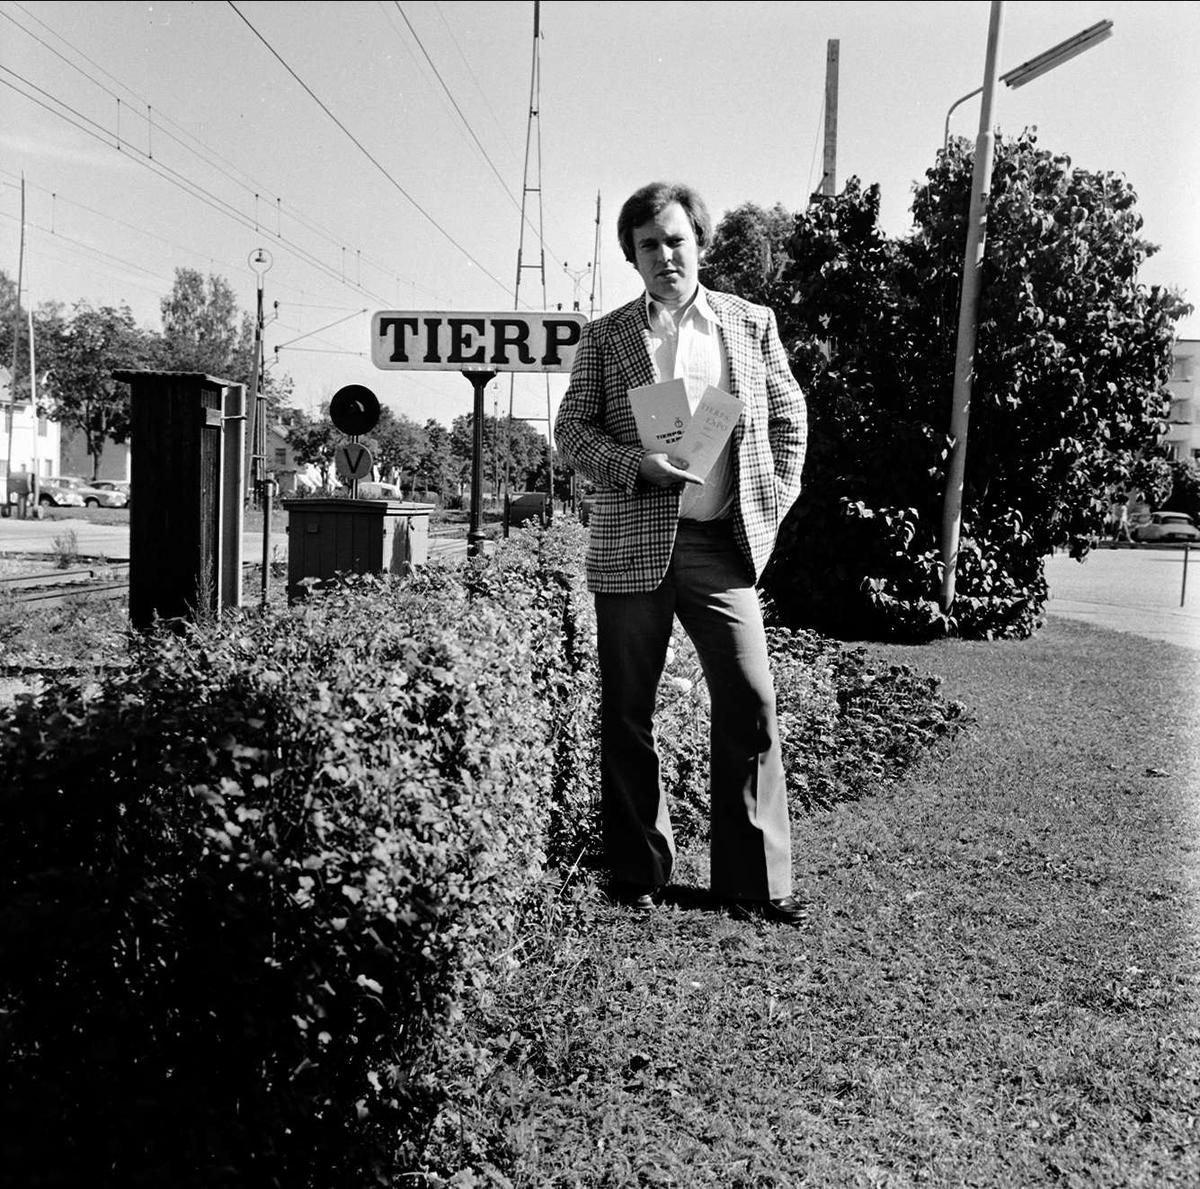 """Dags för 8:e Tierps-expo"", Tierp, Uppland augusti 1973"